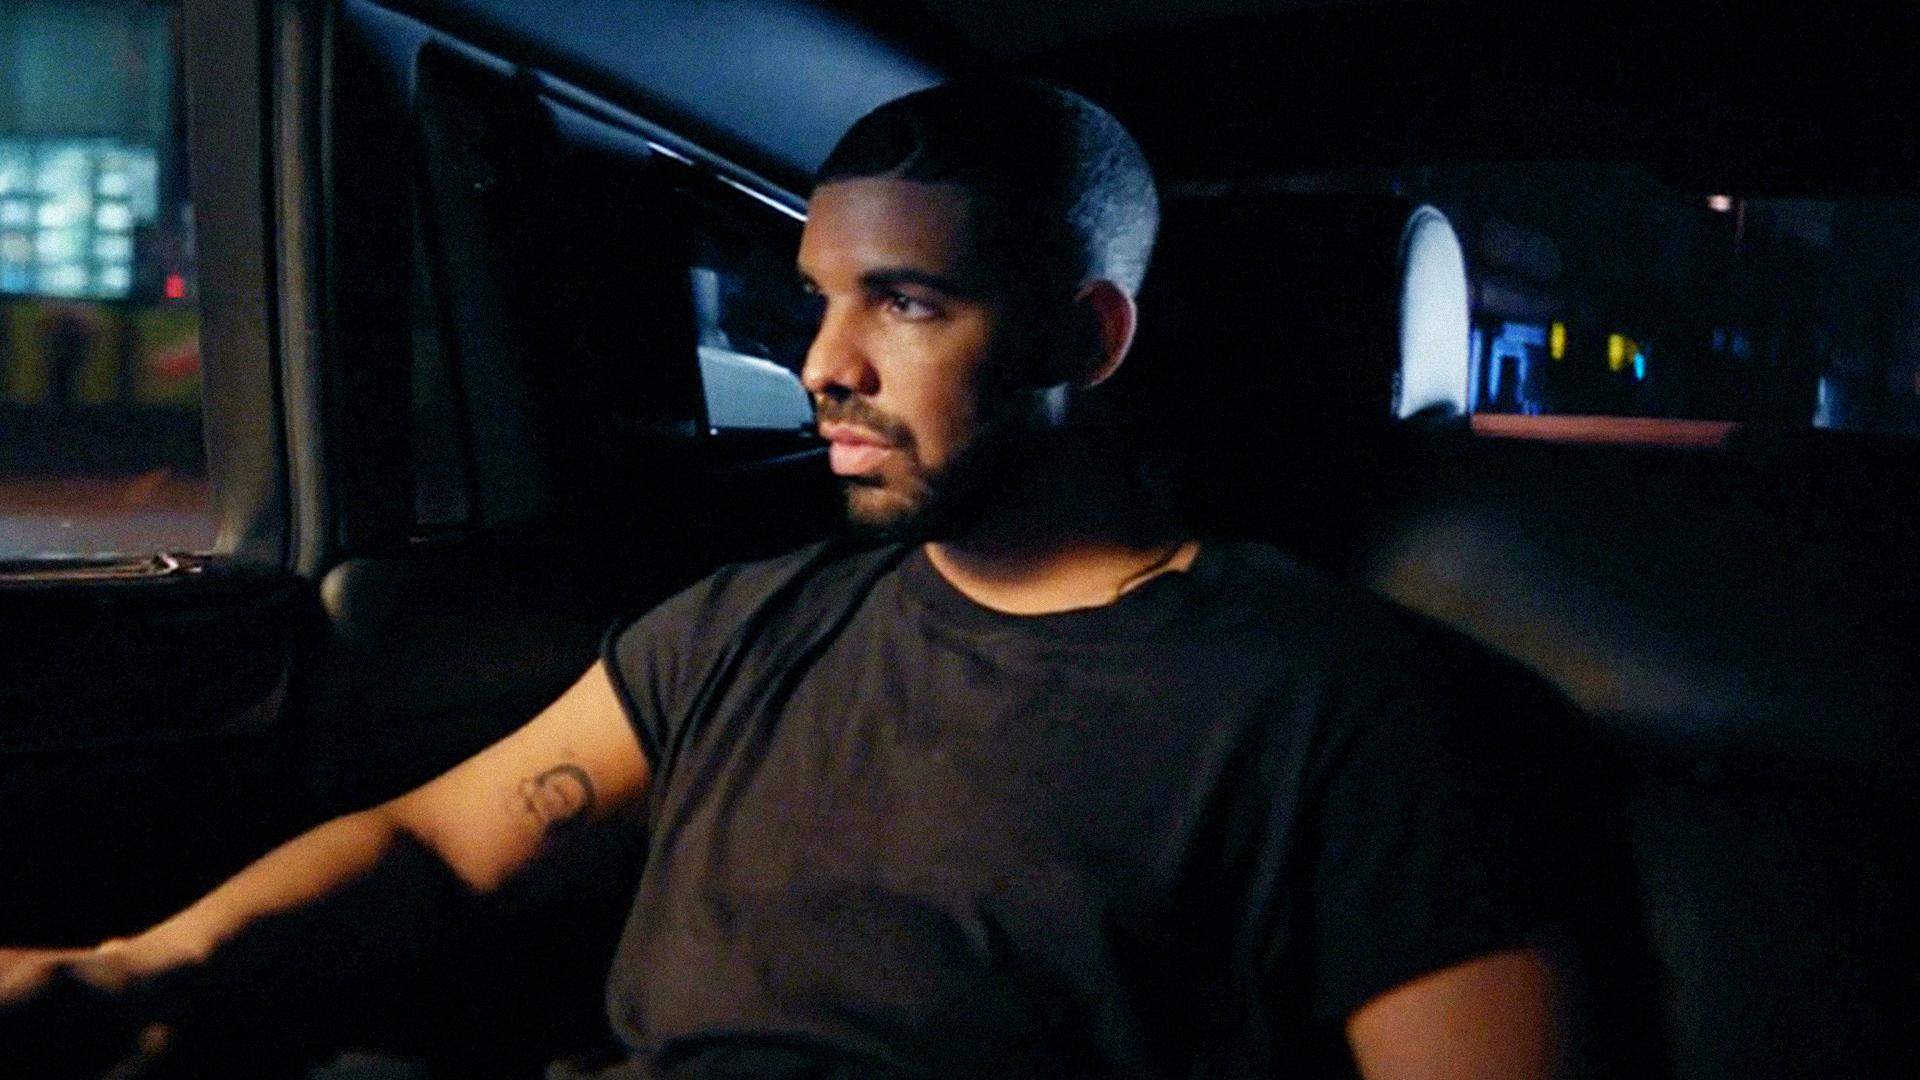 Fall Out Boy Wallpapers Iphone Drake Wallpaper Hd Pixelstalk Net